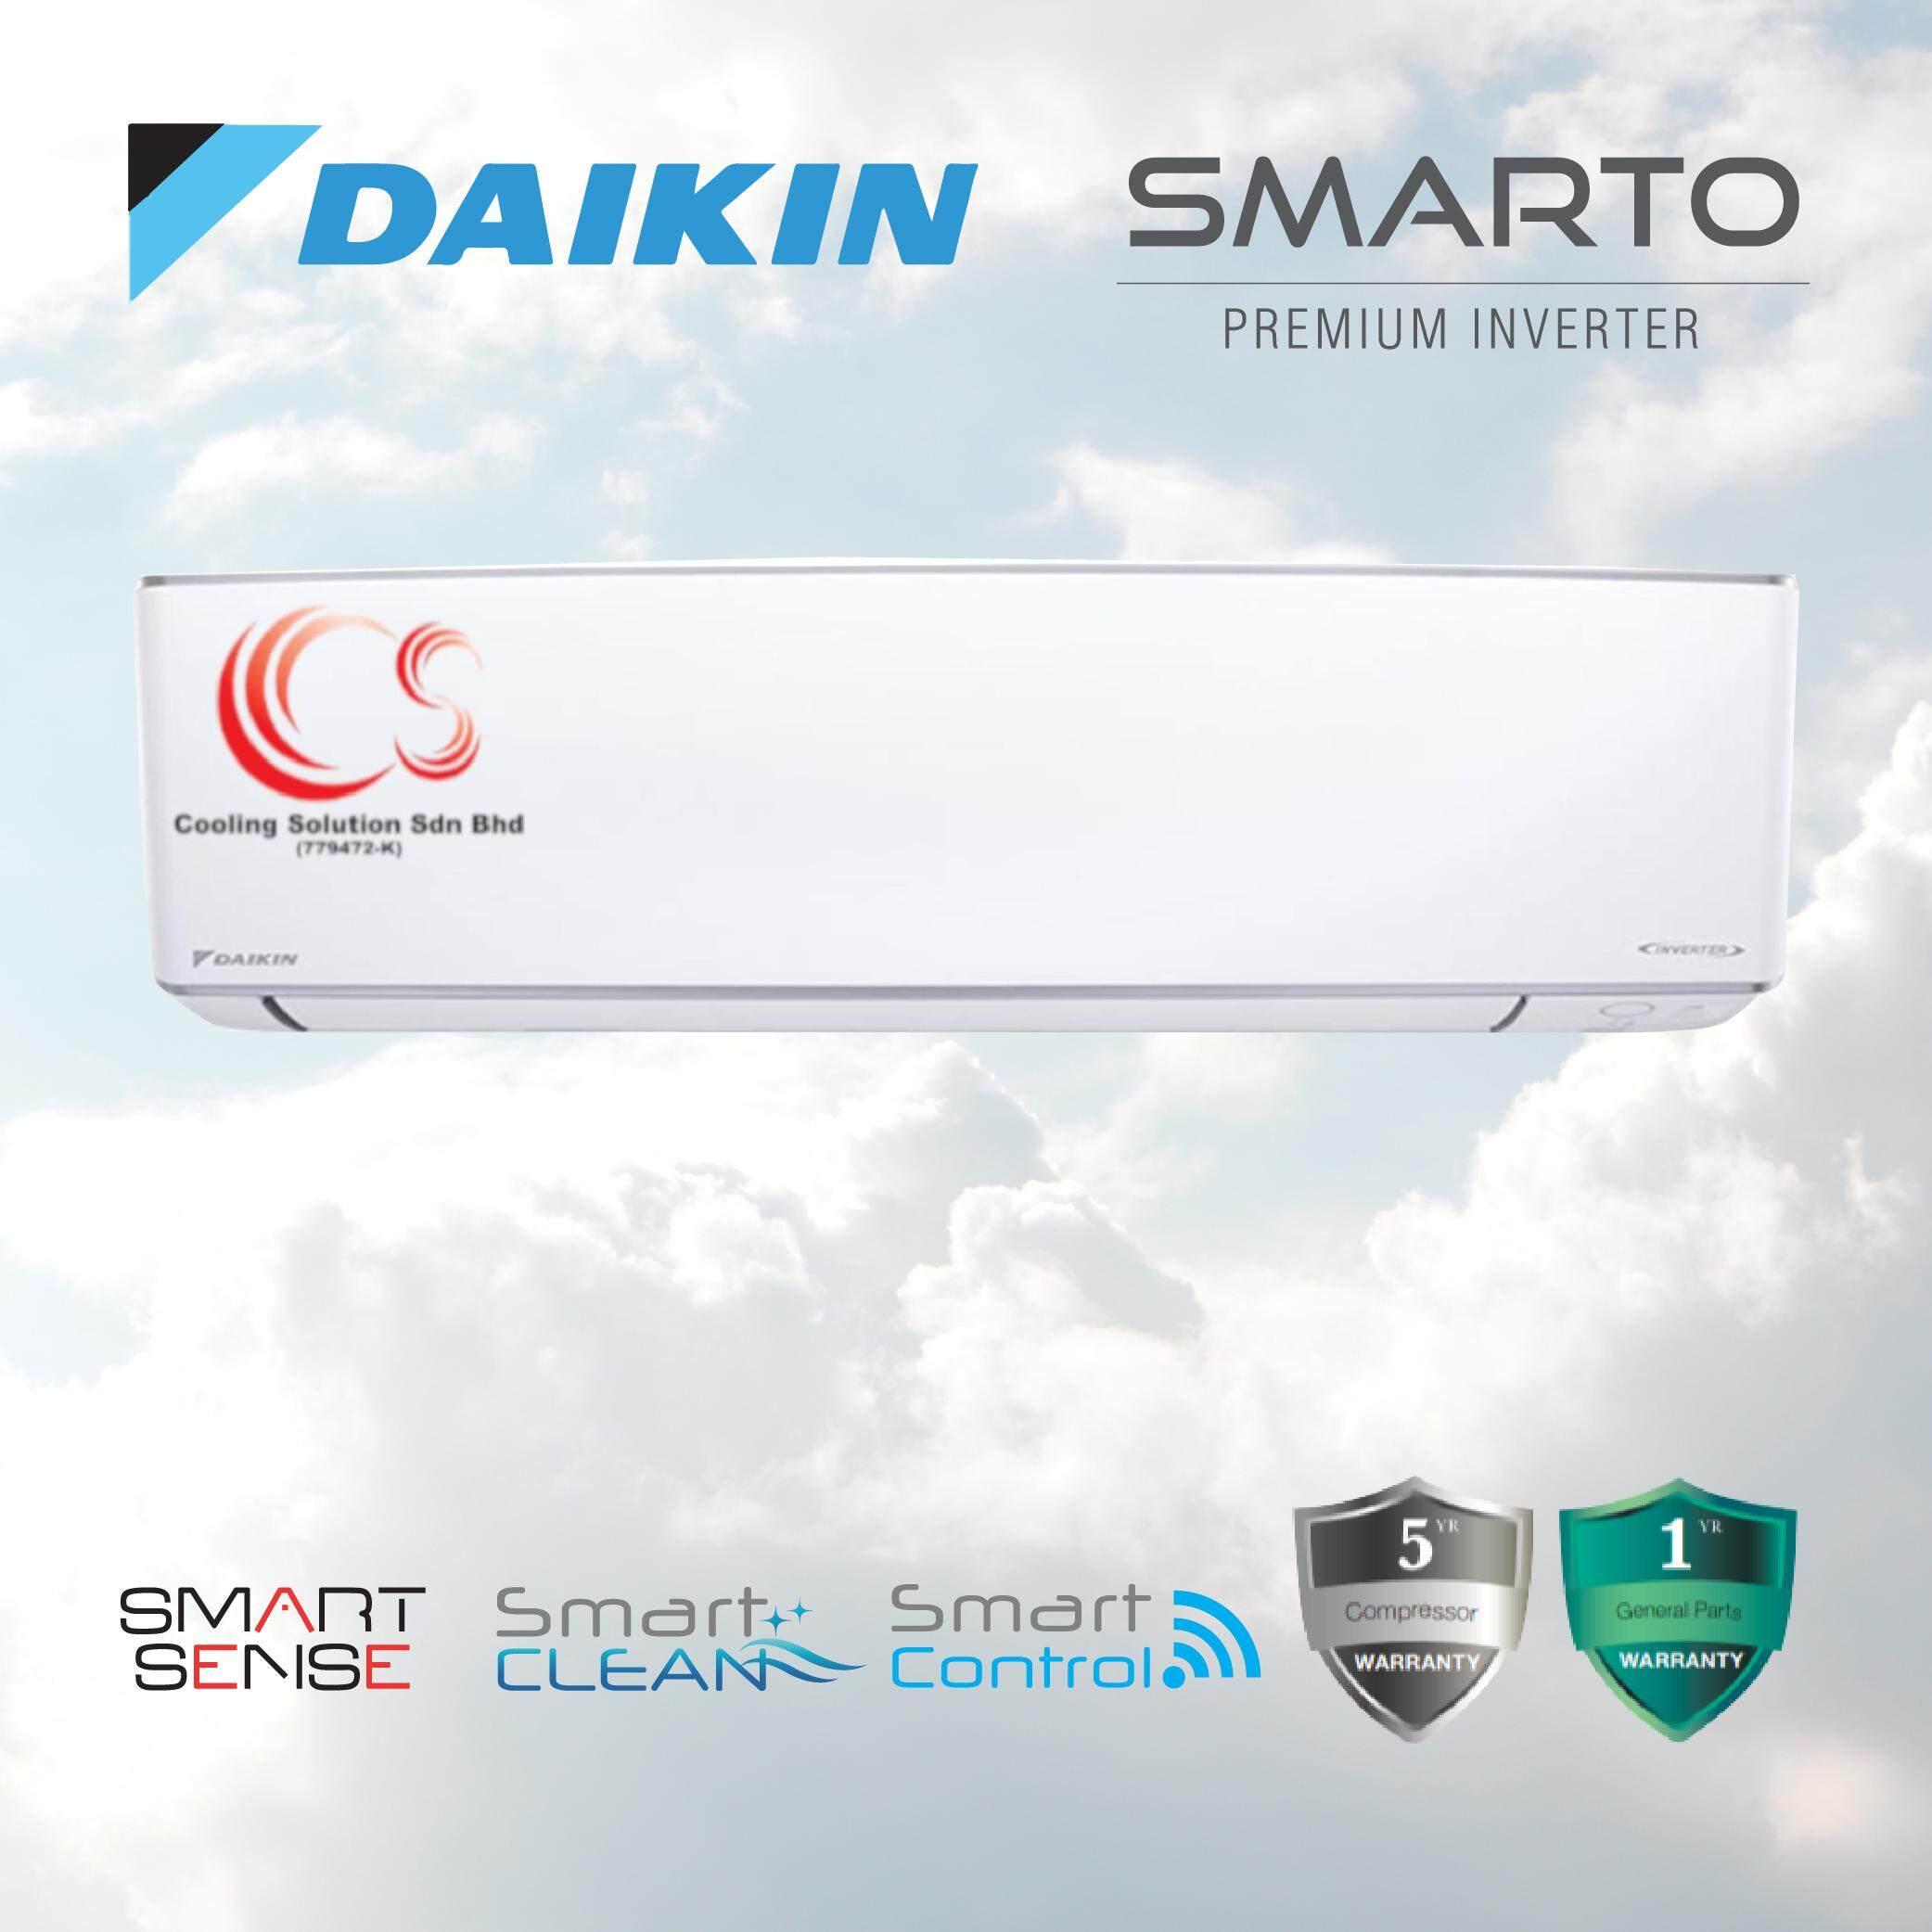 Daikin Air Conditioner SMARTO Premium R32 Inverter 1.5HP FTKH35A/RKU35F-3WMY-L + Smart Sense + Smart Clean + Smart Control